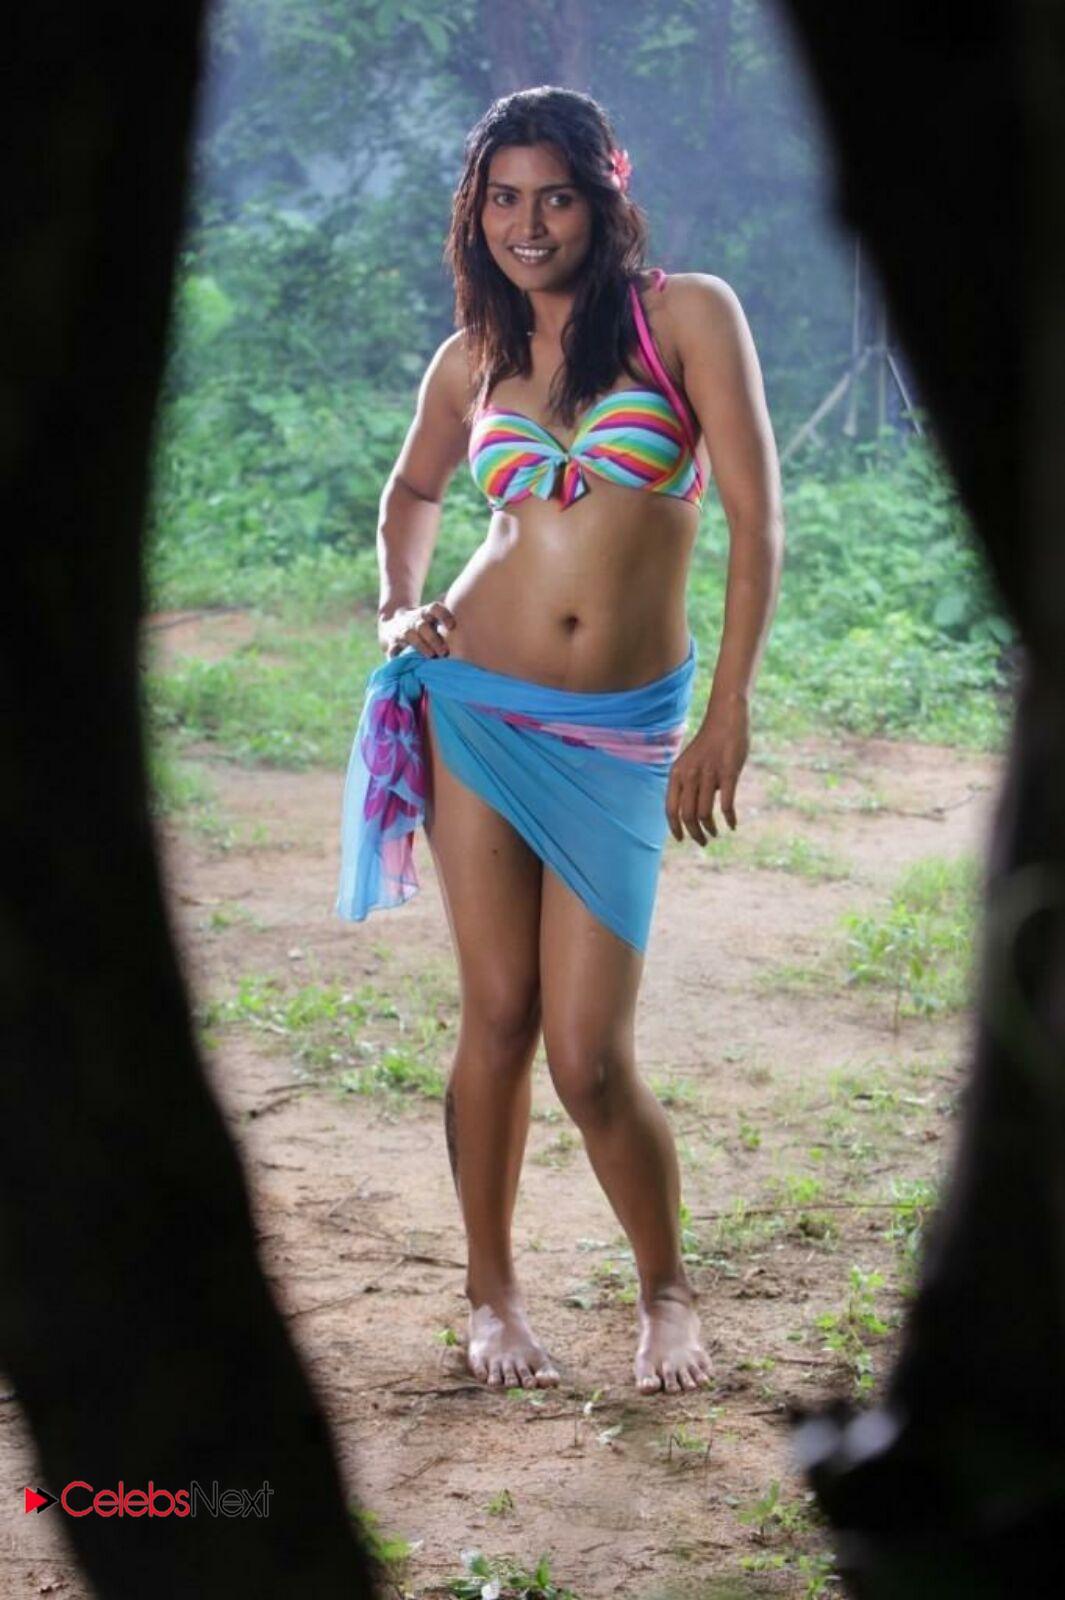 Sravanthi Latest Hot Photo Gallery in Bikini